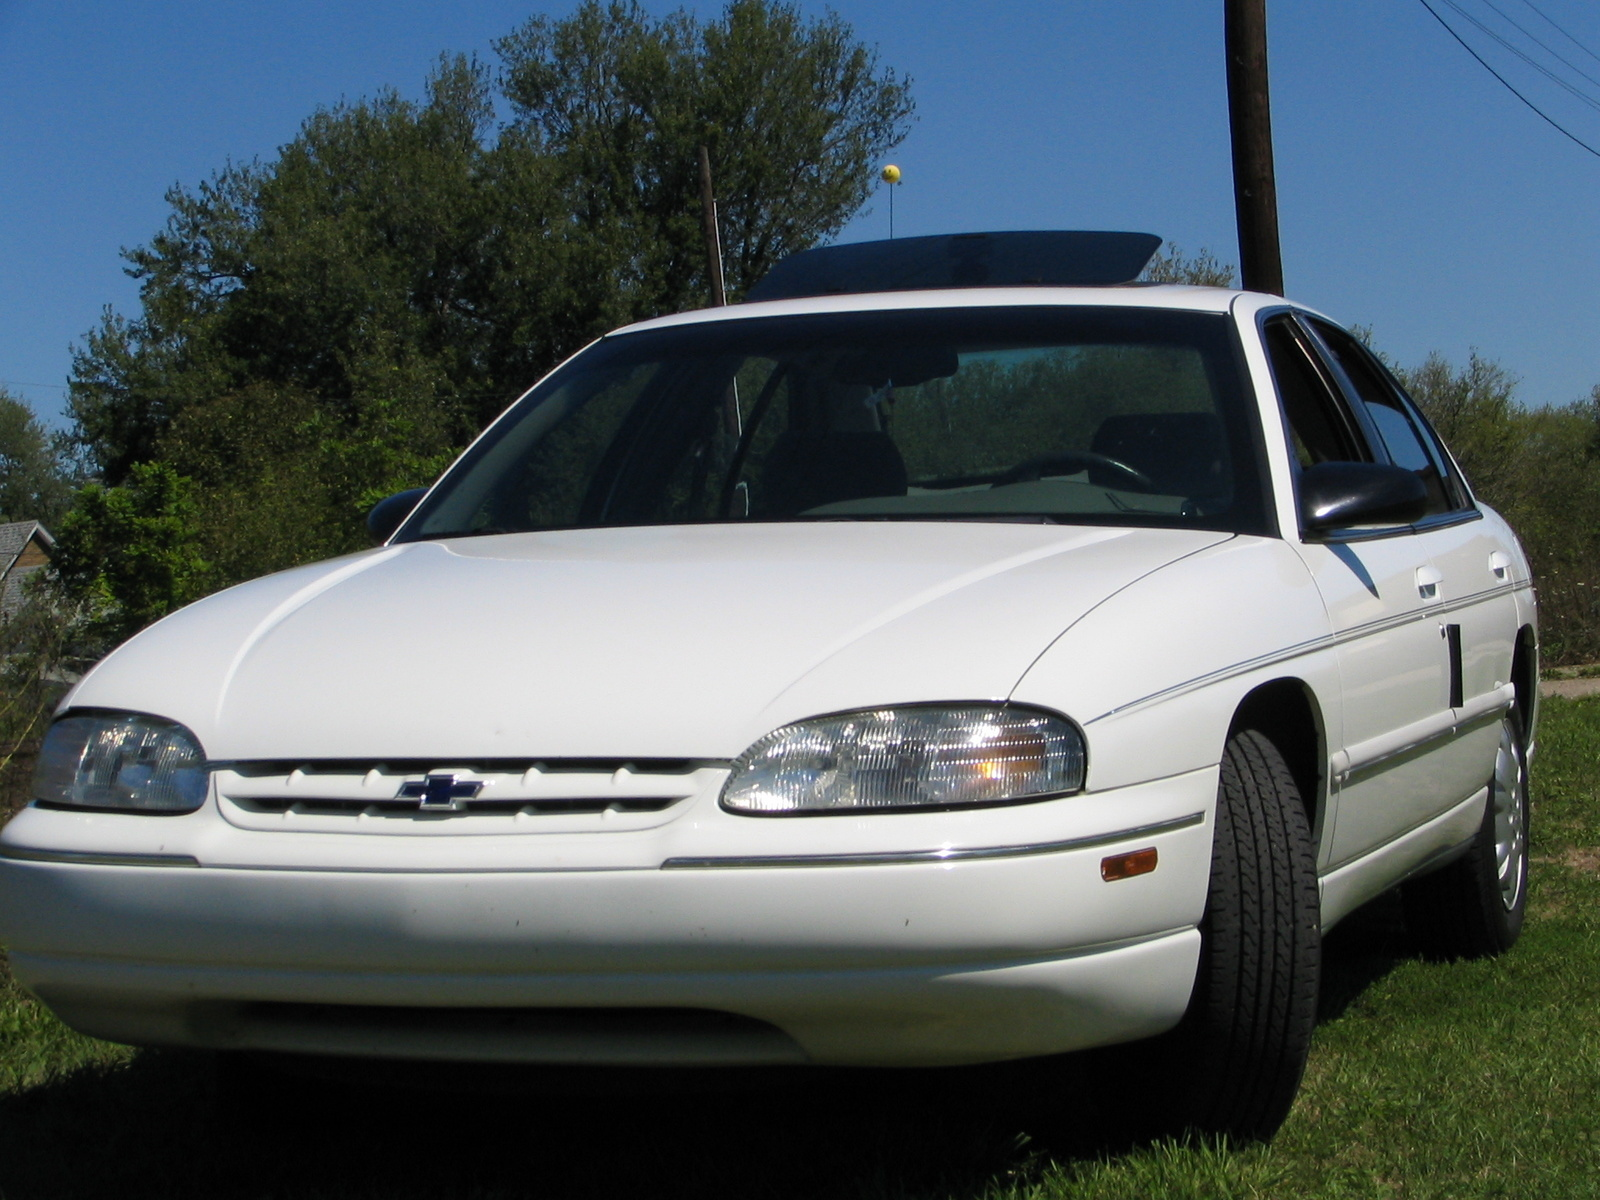 Used 1999 Chevrolet Lumina Sedan Review Edmunds